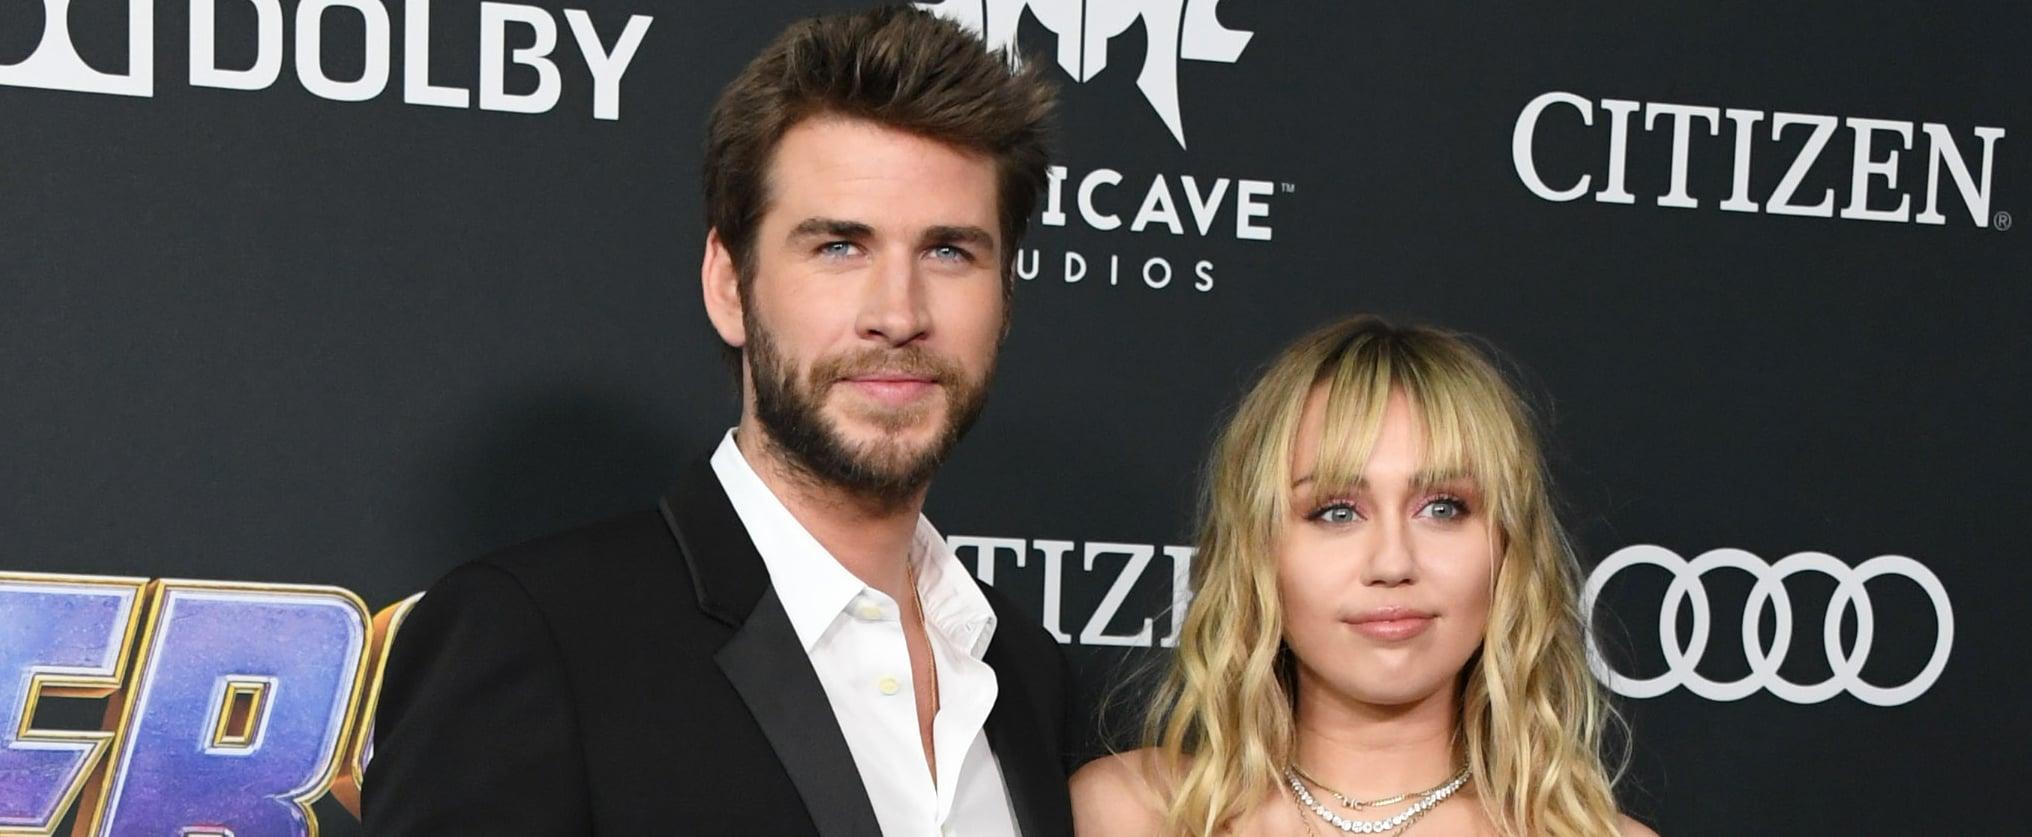 Miley Cyrus and Liam Hemsworth Divorce